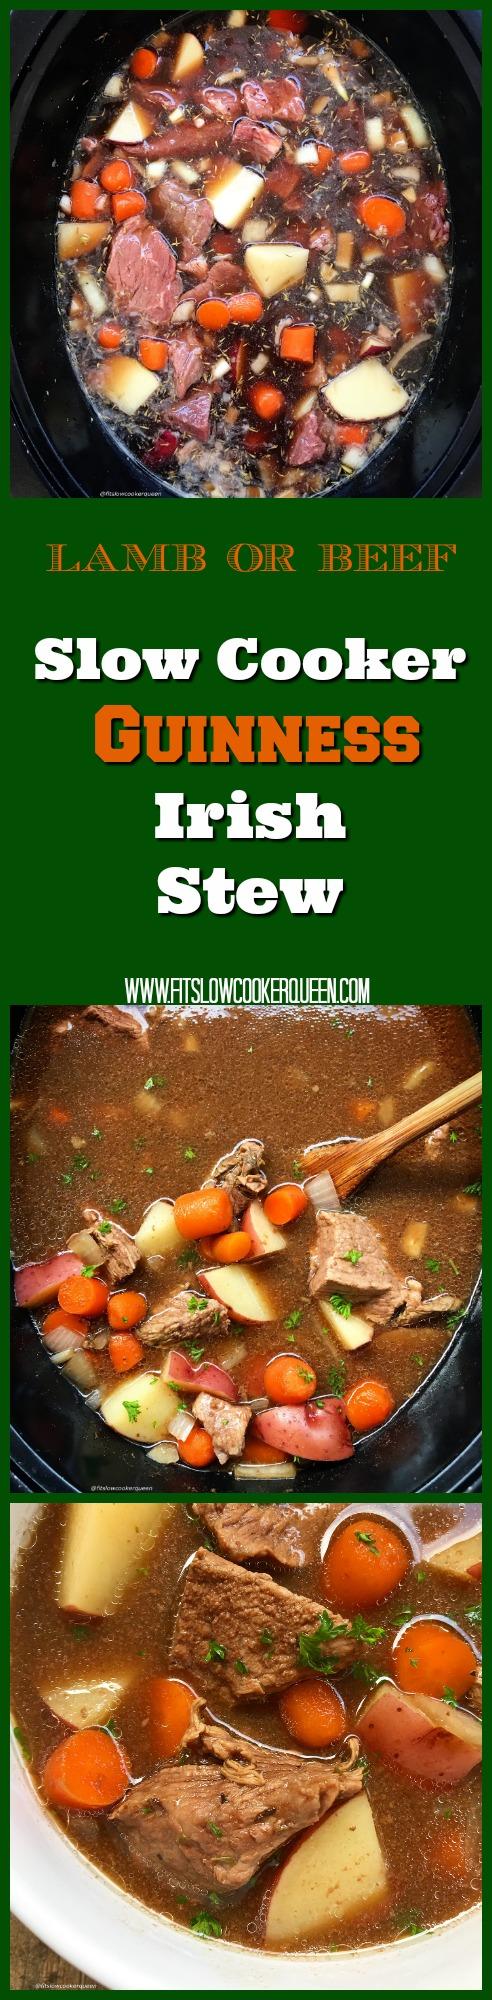 SLOW COOKER GUINNESS IRISH STEW FIT SLOW COOKER QUEEN